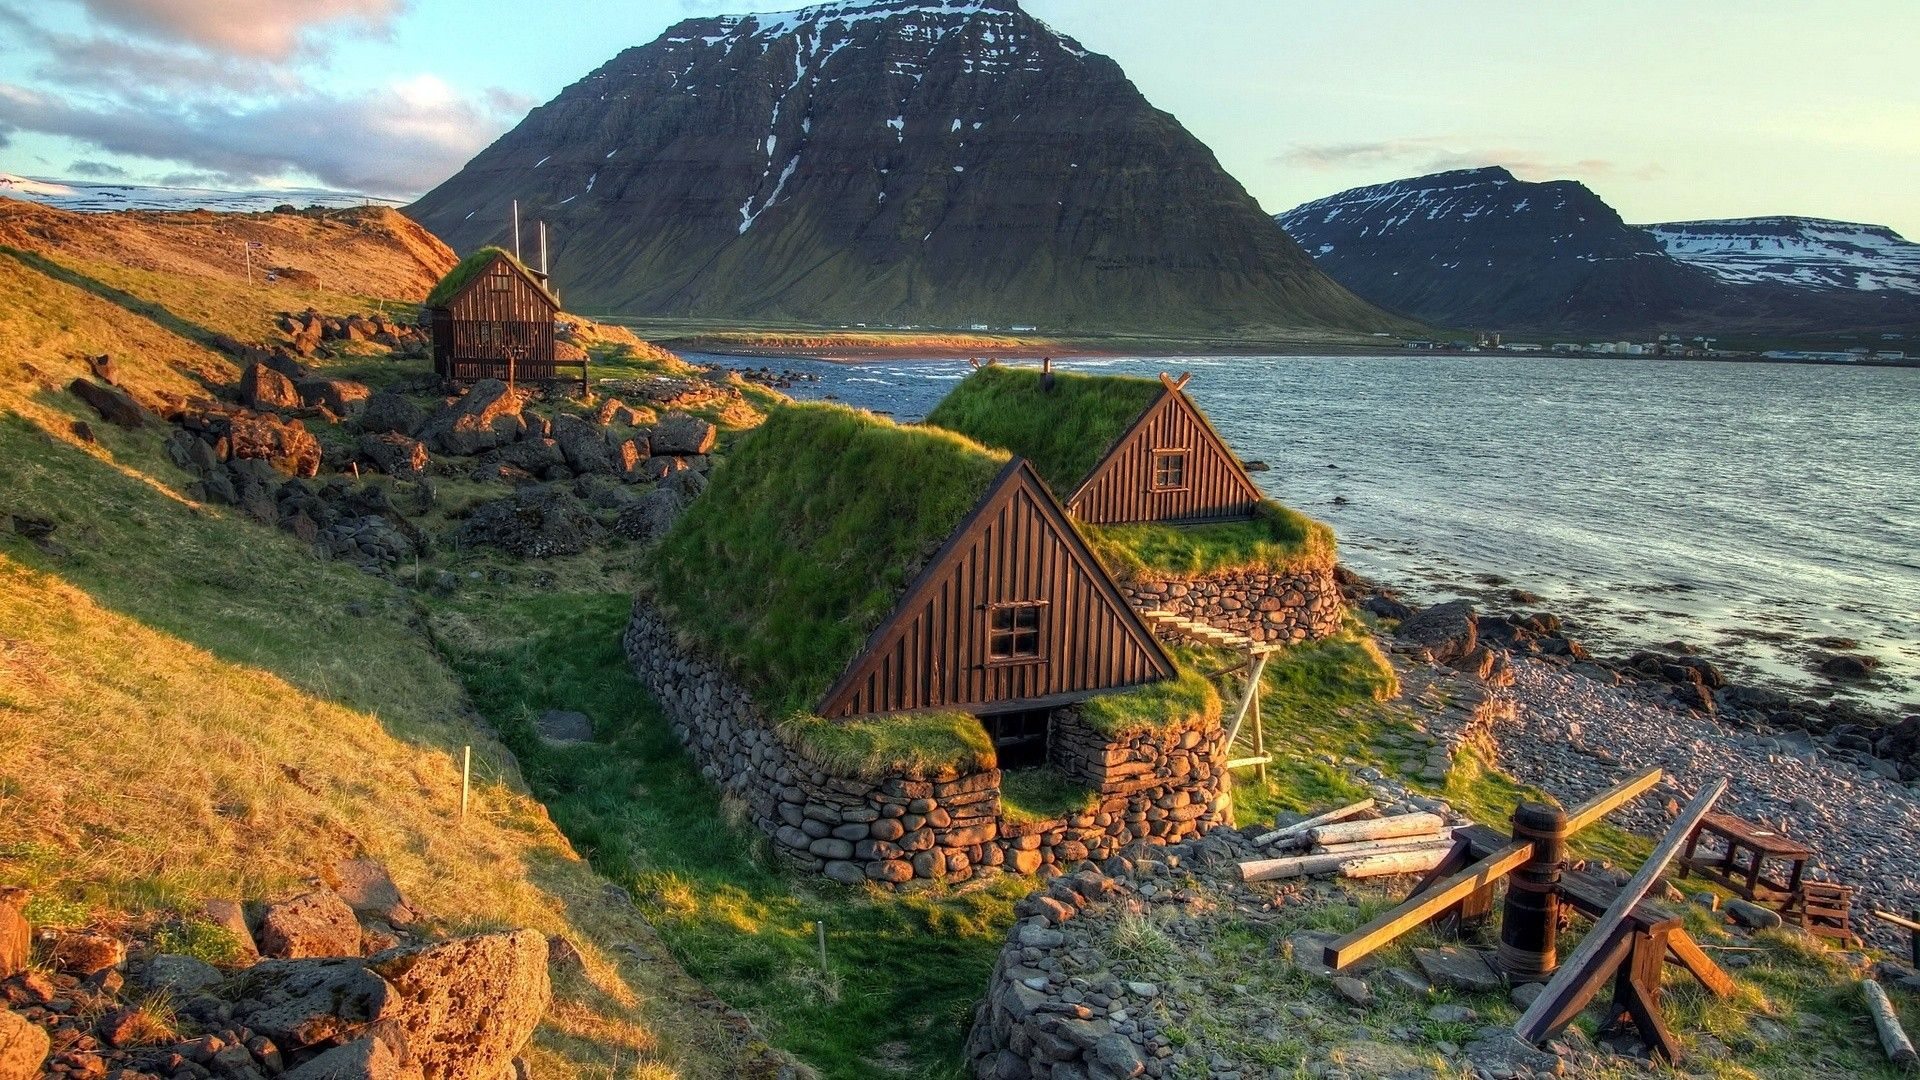 Iceland hd wallpaper download